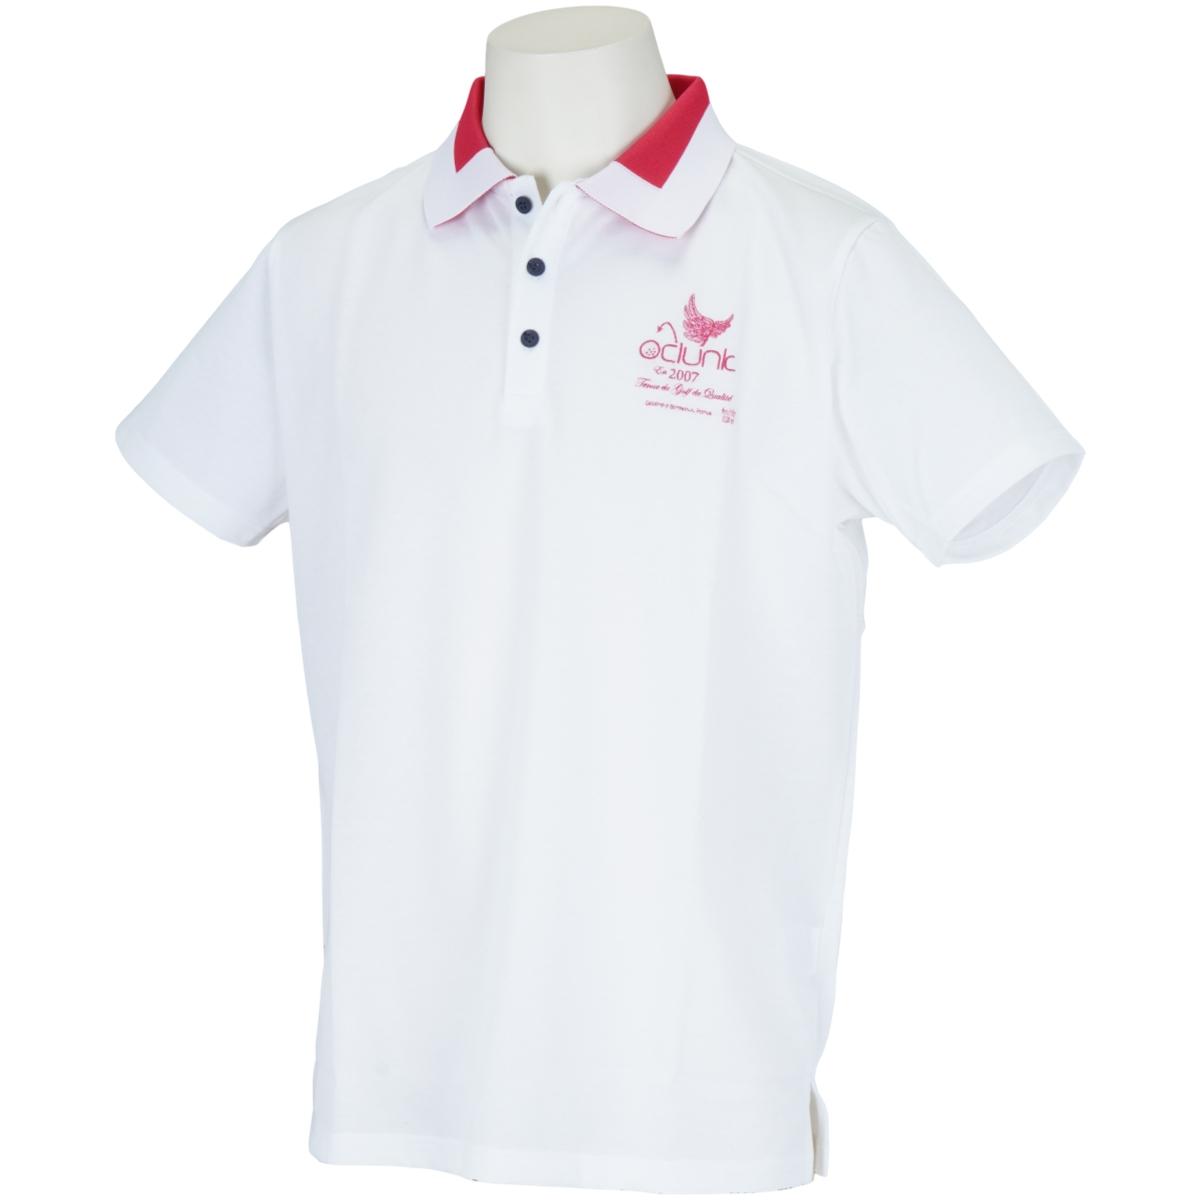 COLLAR ACCSENT 半袖ポロシャツ